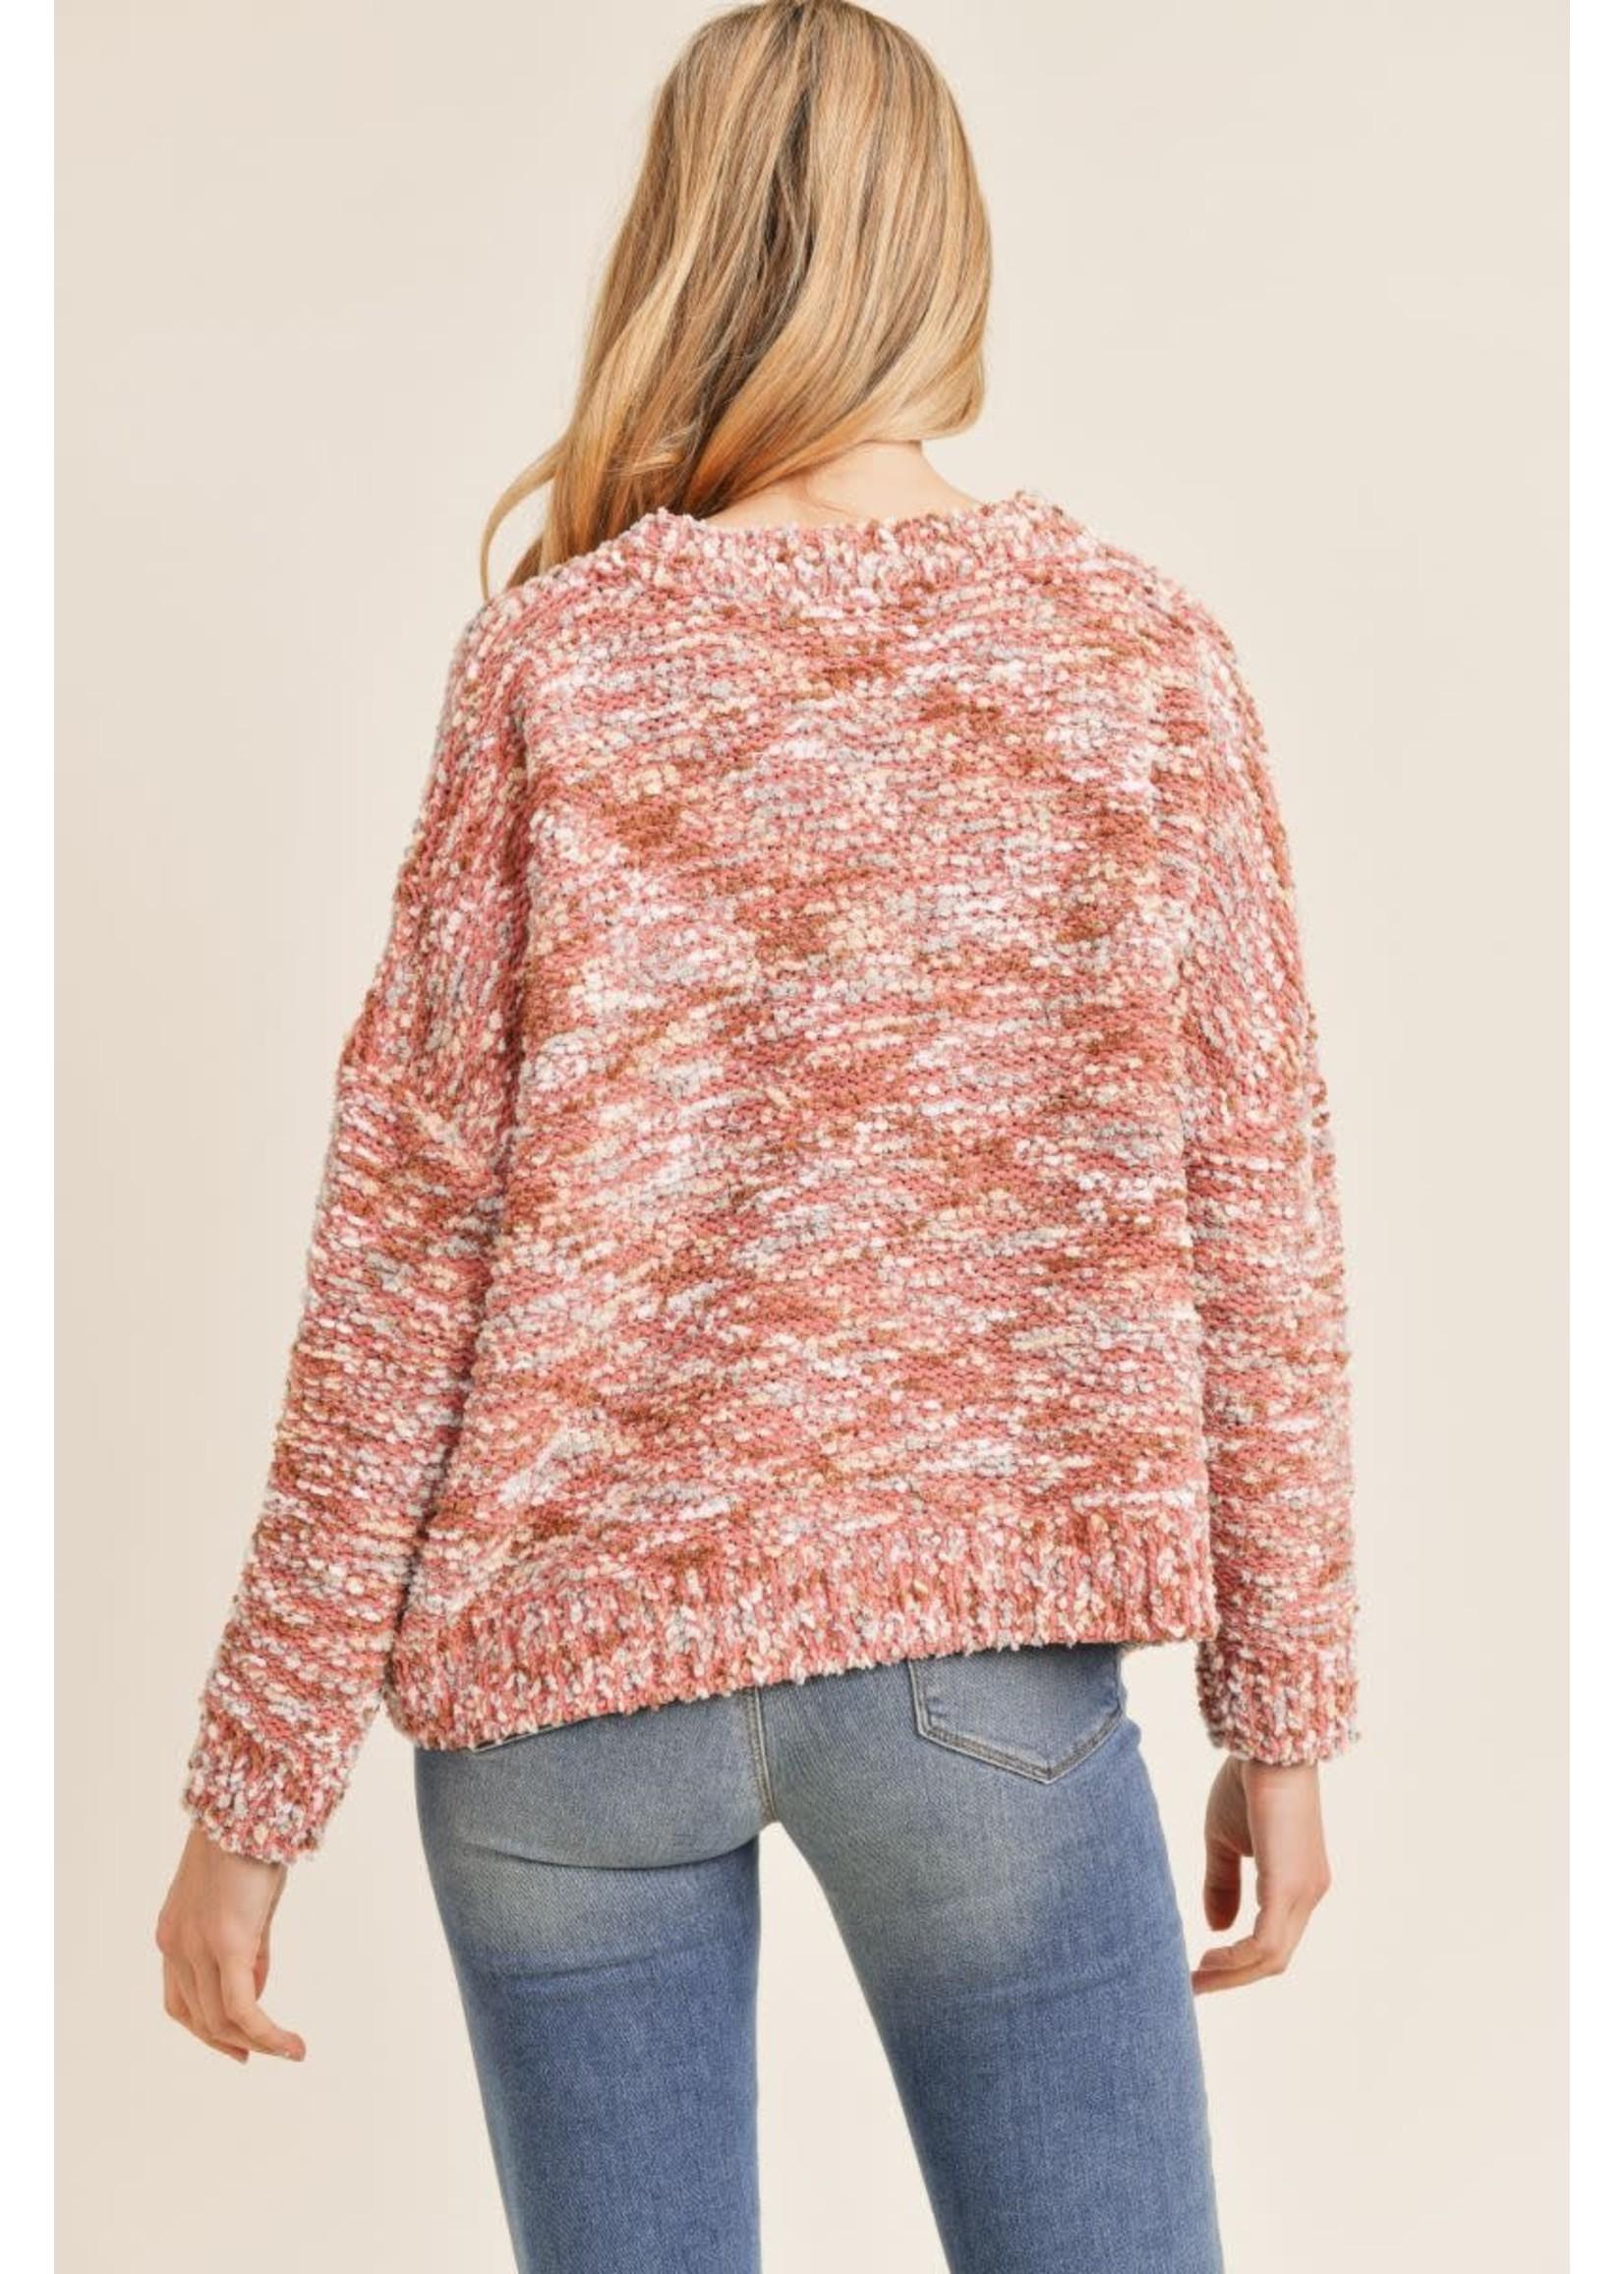 Sadie & Sage Note to Self Sweater - AC342890